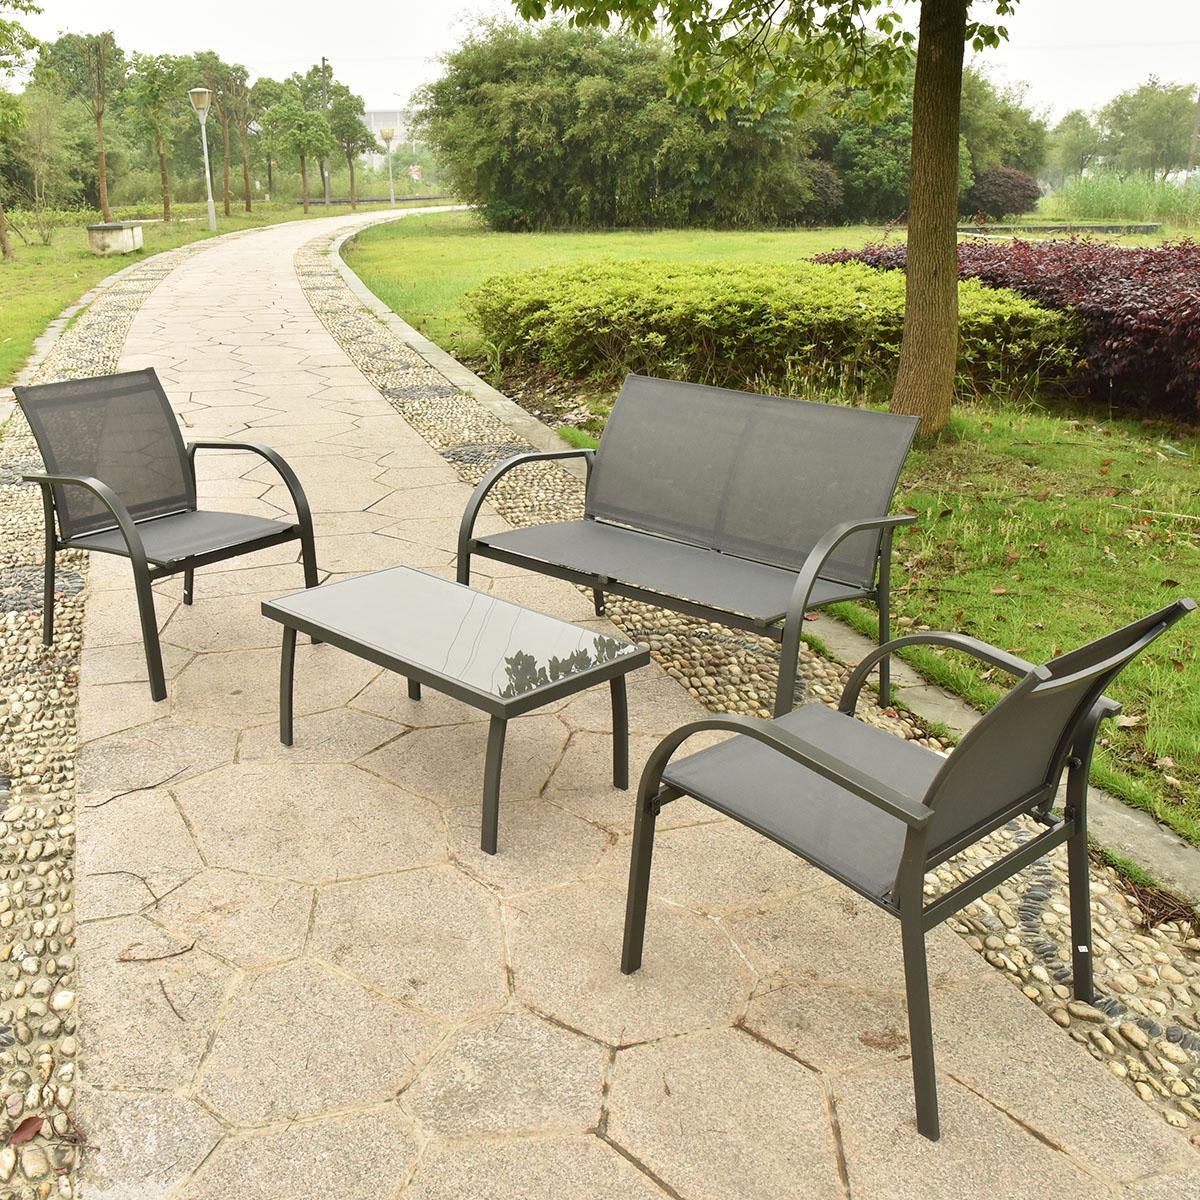 garden chairs costway 4pcs patio garden furniture set steel frame outdoor lawn sofa chairs PCDRFWX